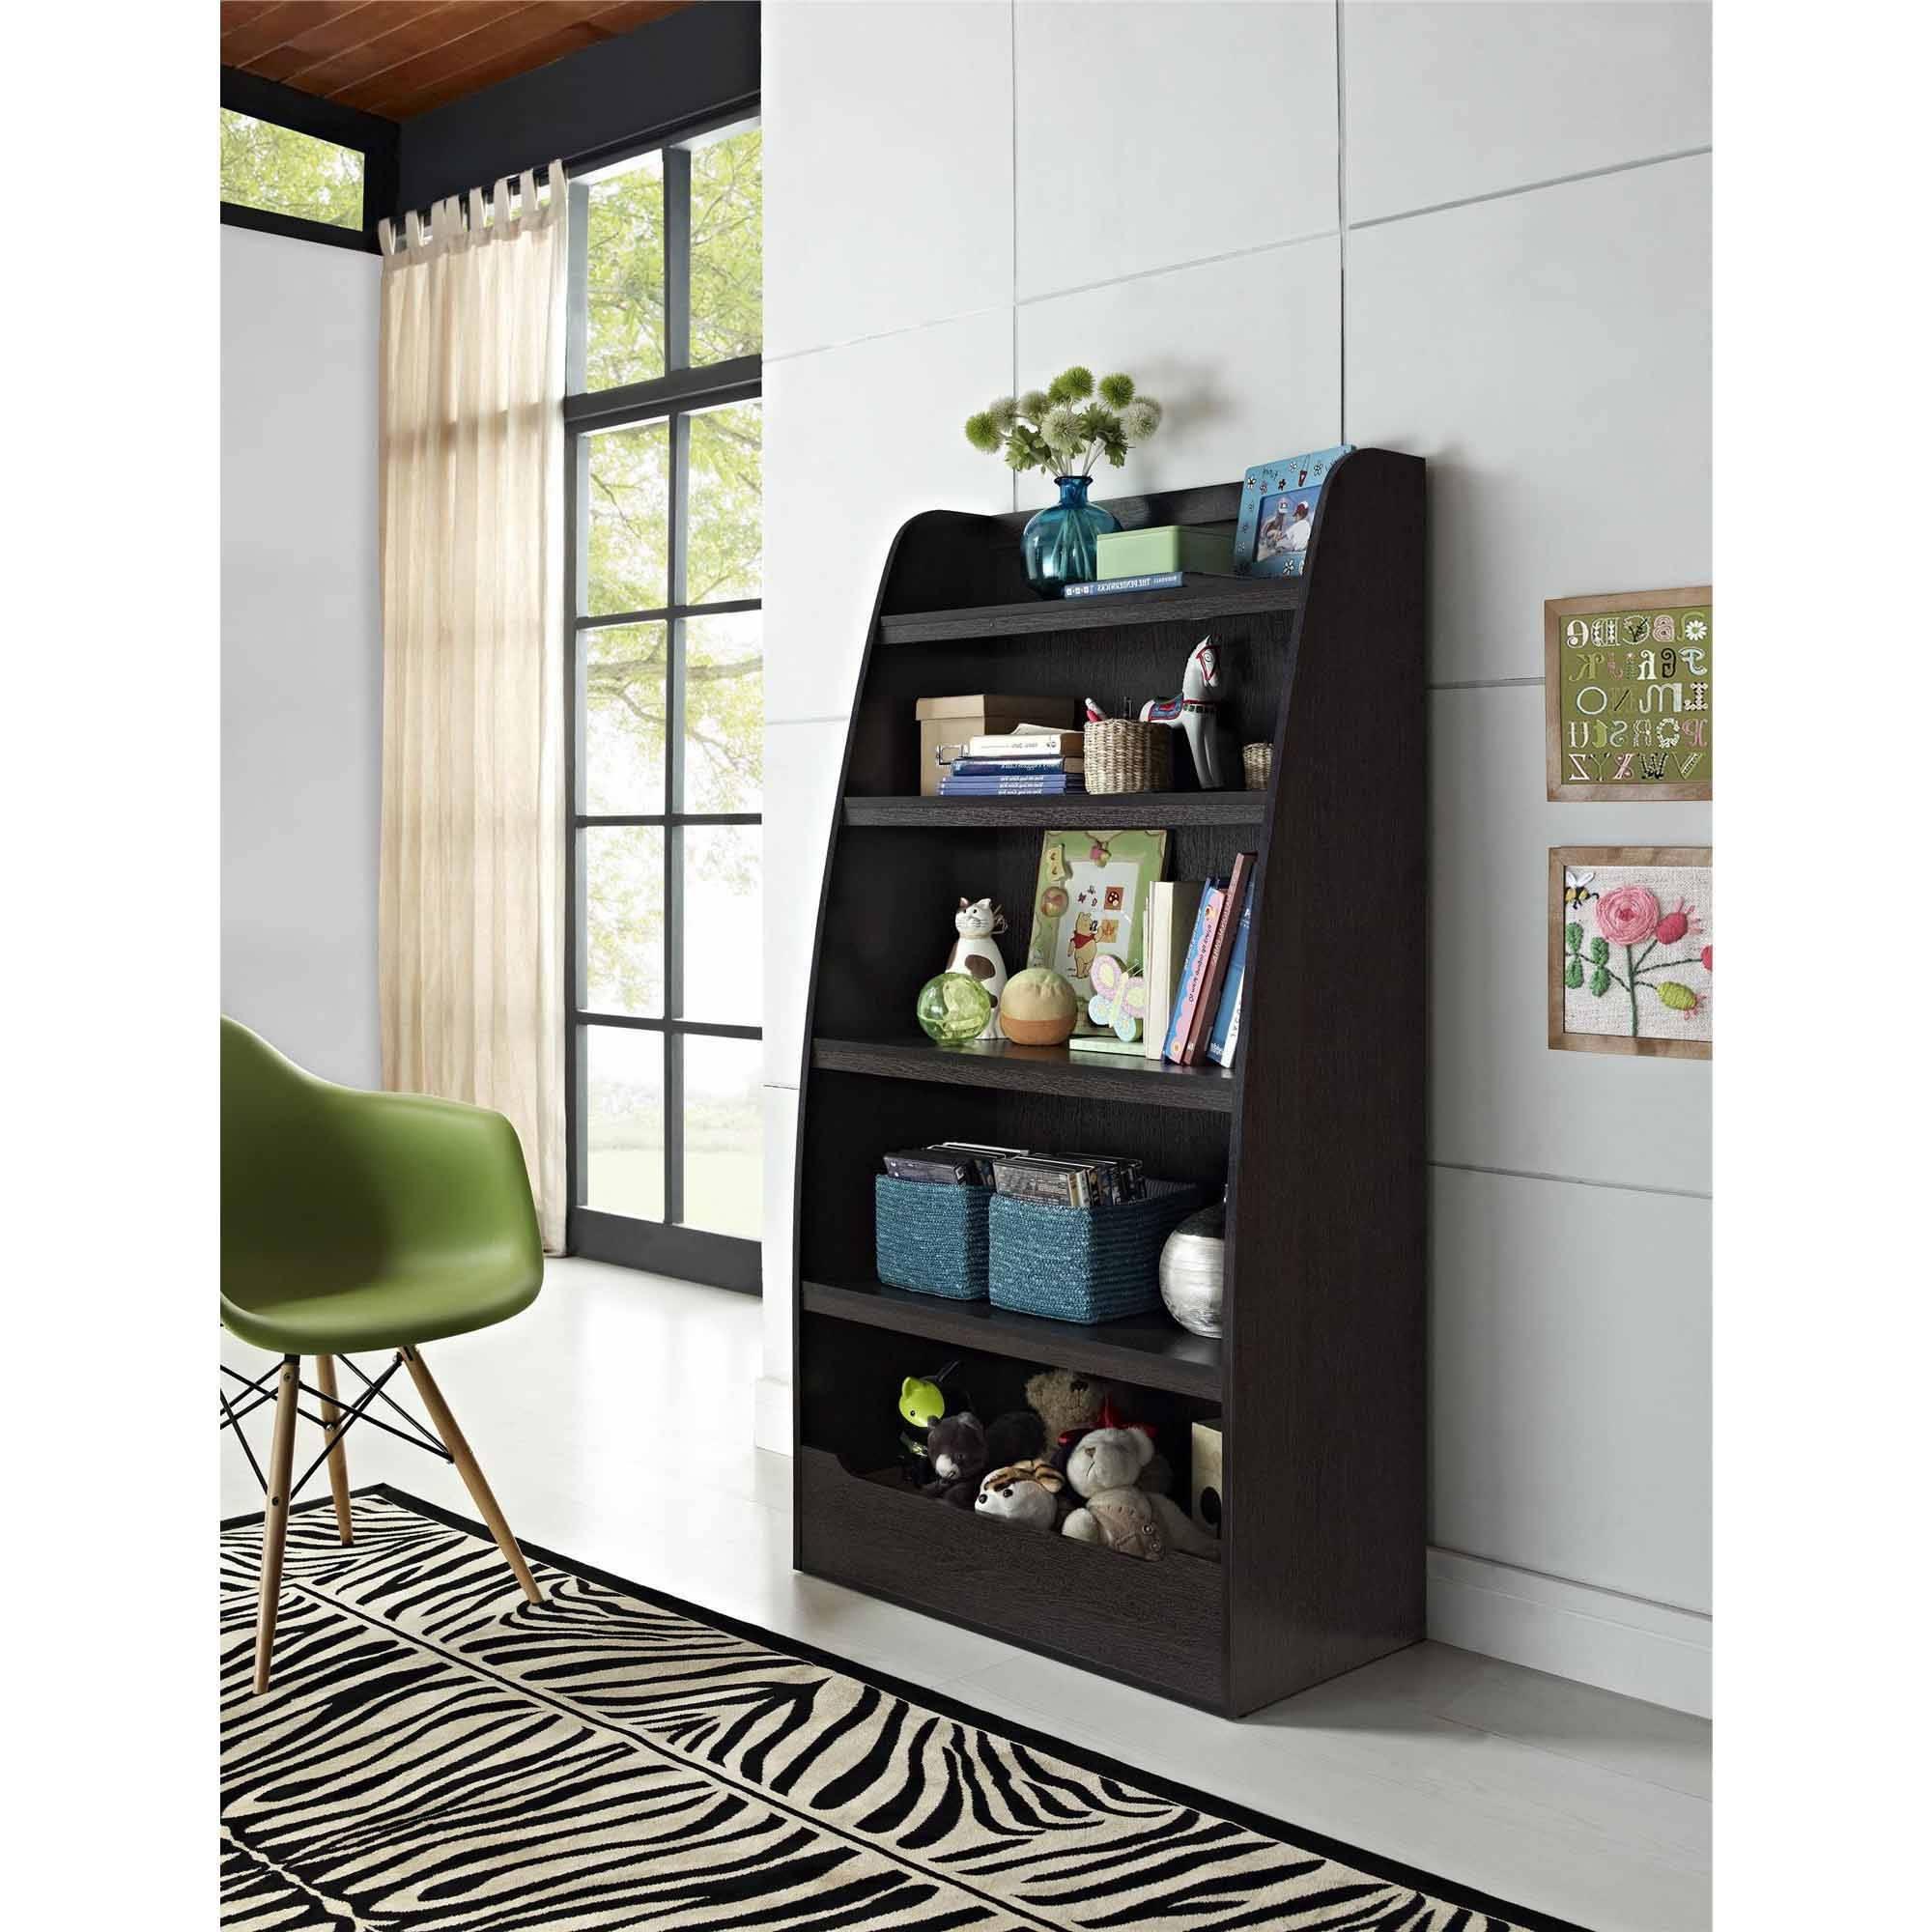 Ameriwood 3 Shelf Bookcases Regarding 2017 Ameriwood Home Mia Kids 4 Shelf Bookcase, Espresso – Walmart (View 11 of 15)